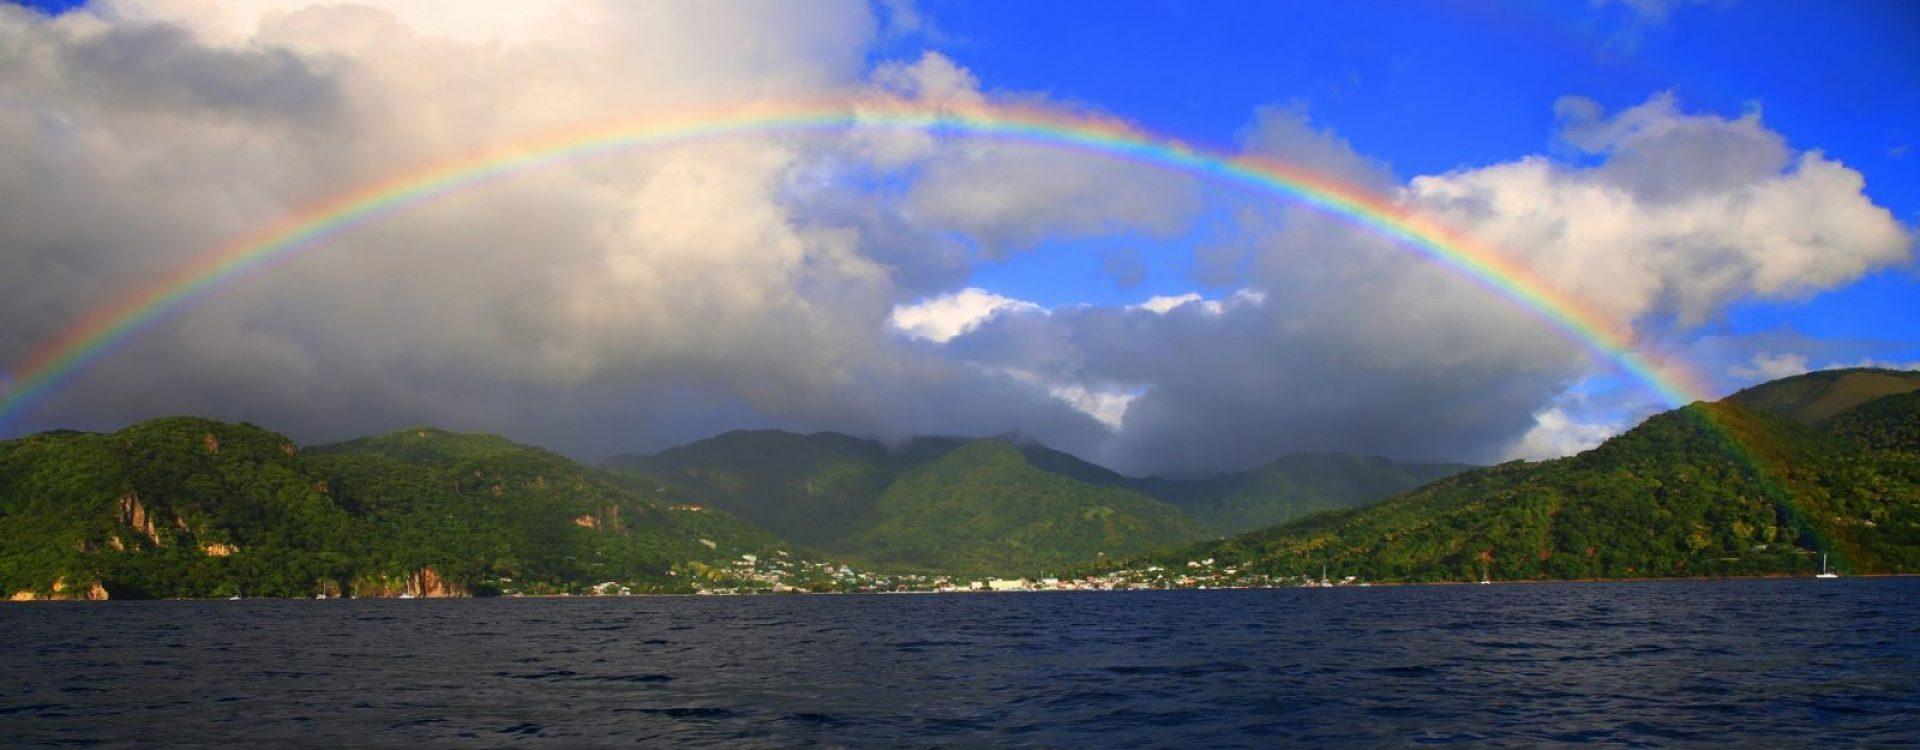 Rainbow in Soufrière